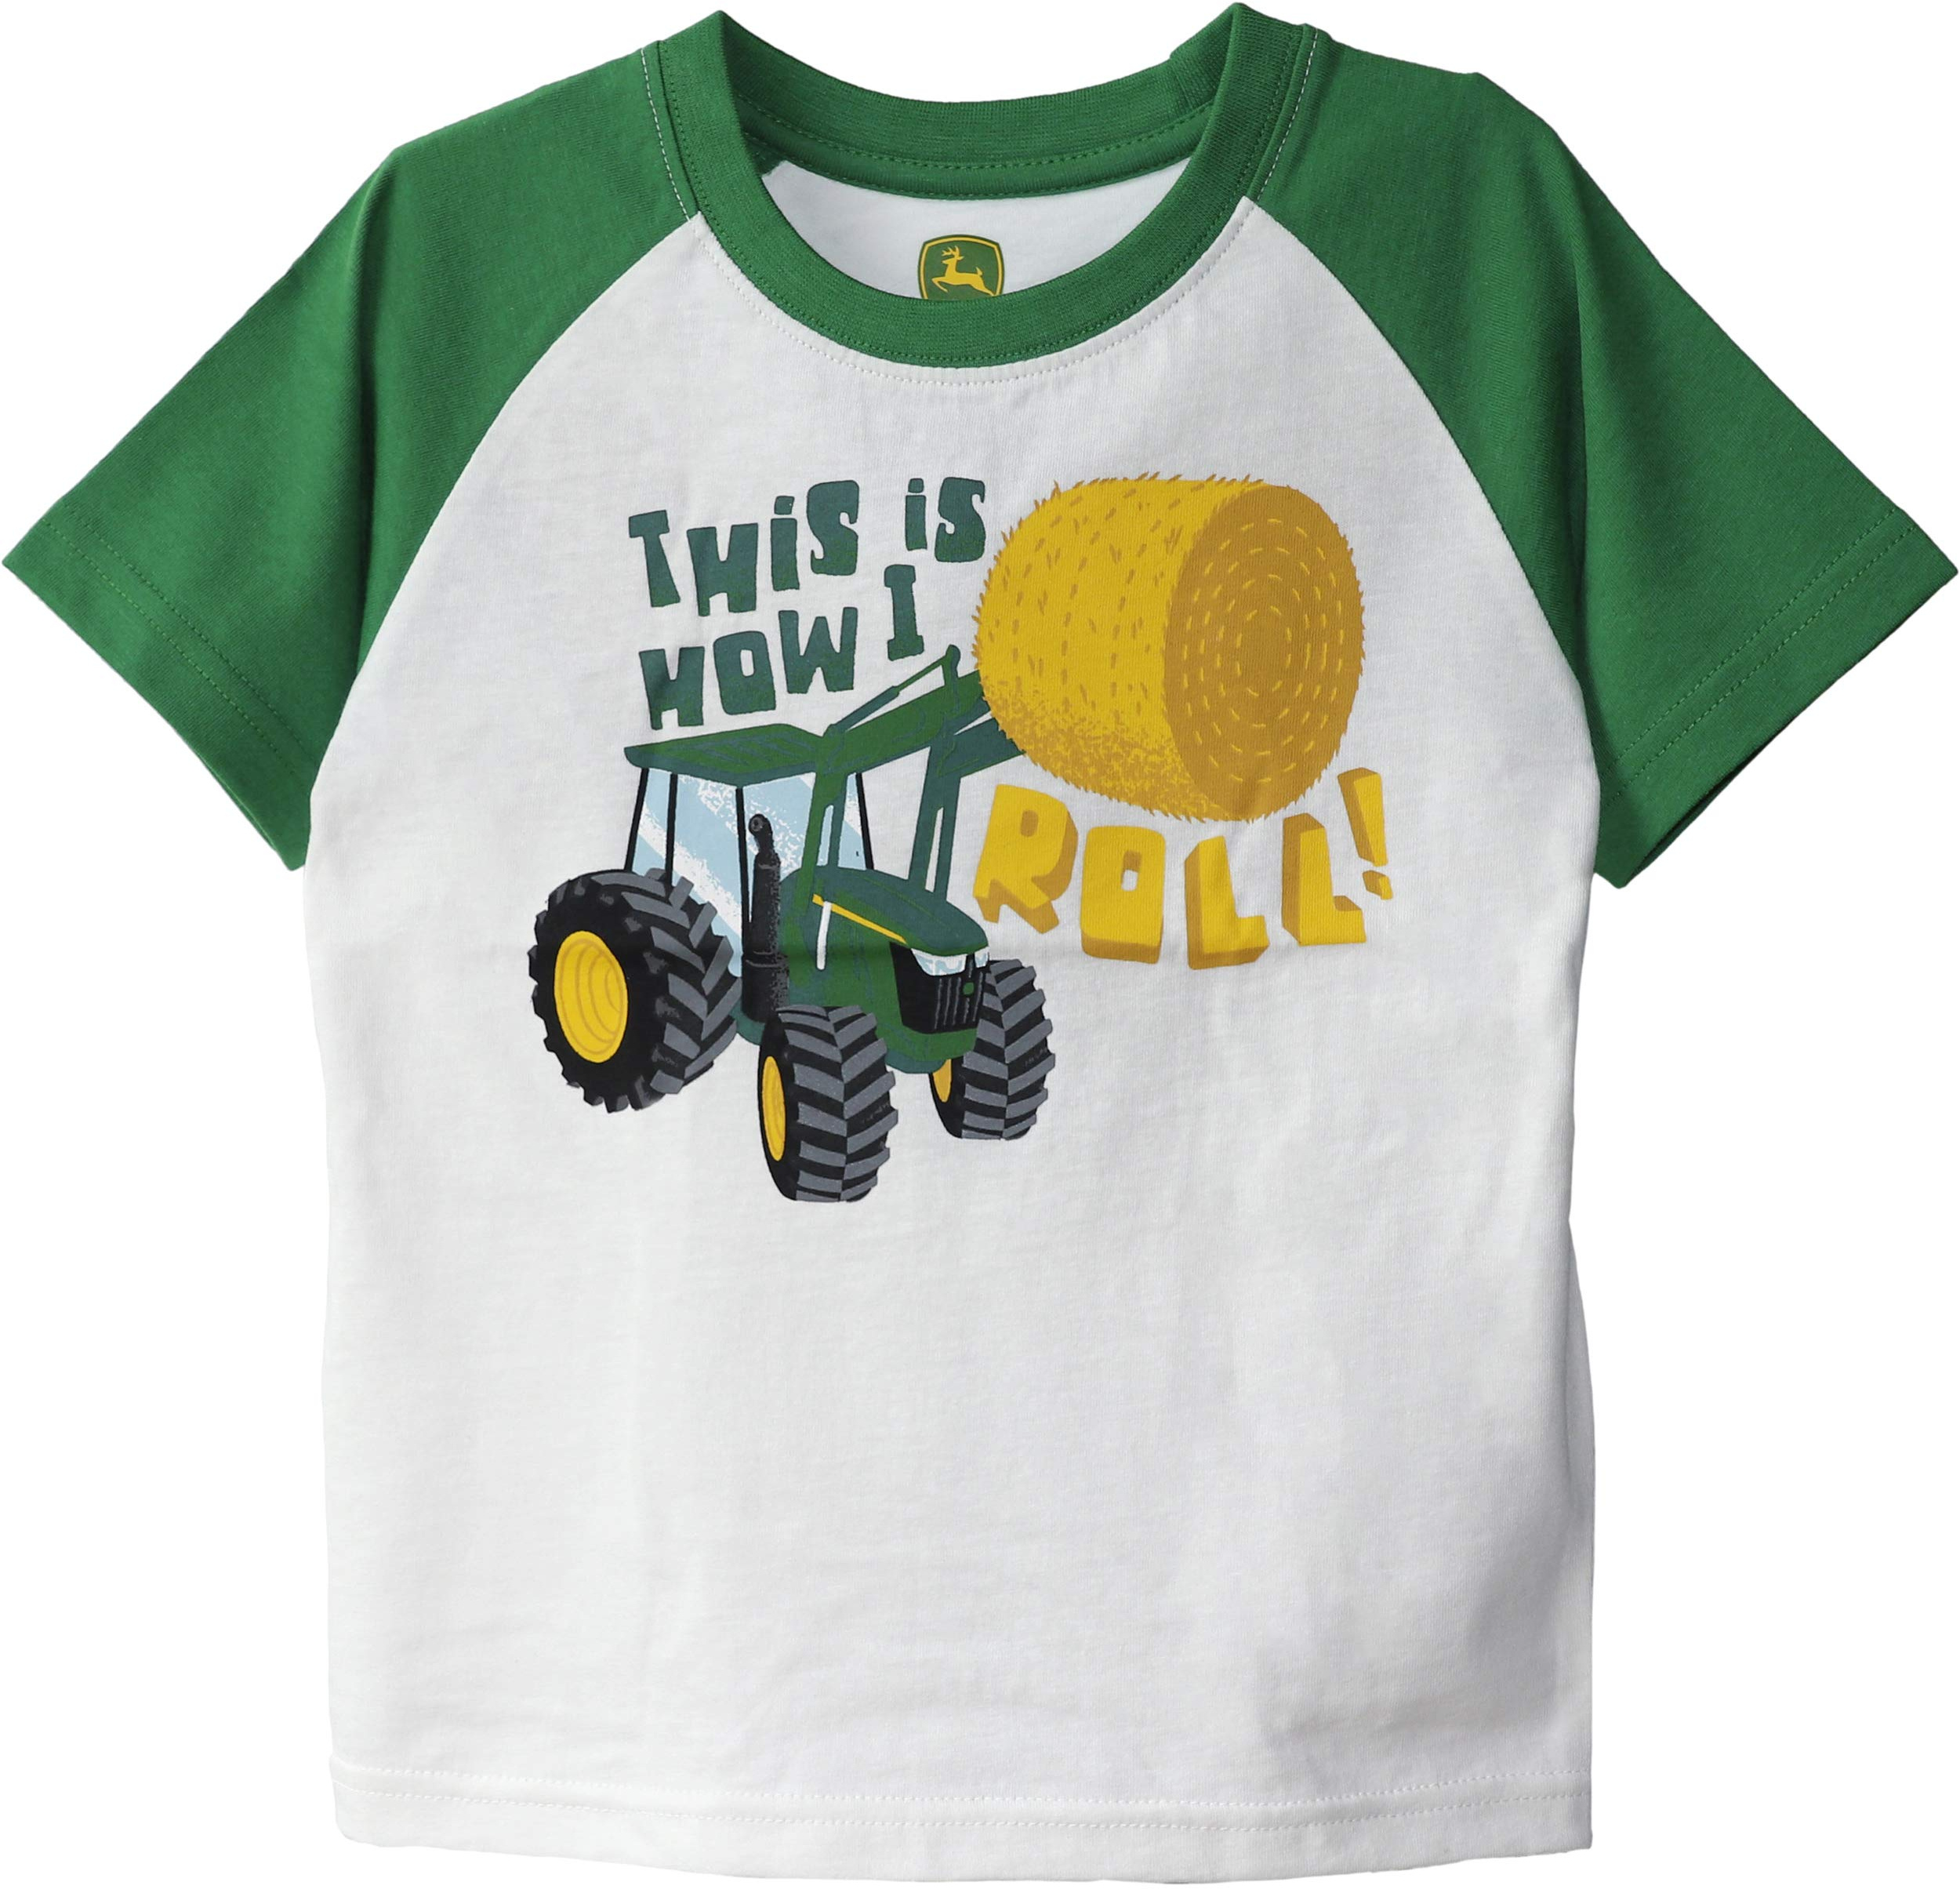 Toddler Boys' Short Sleeve Tee John Deere